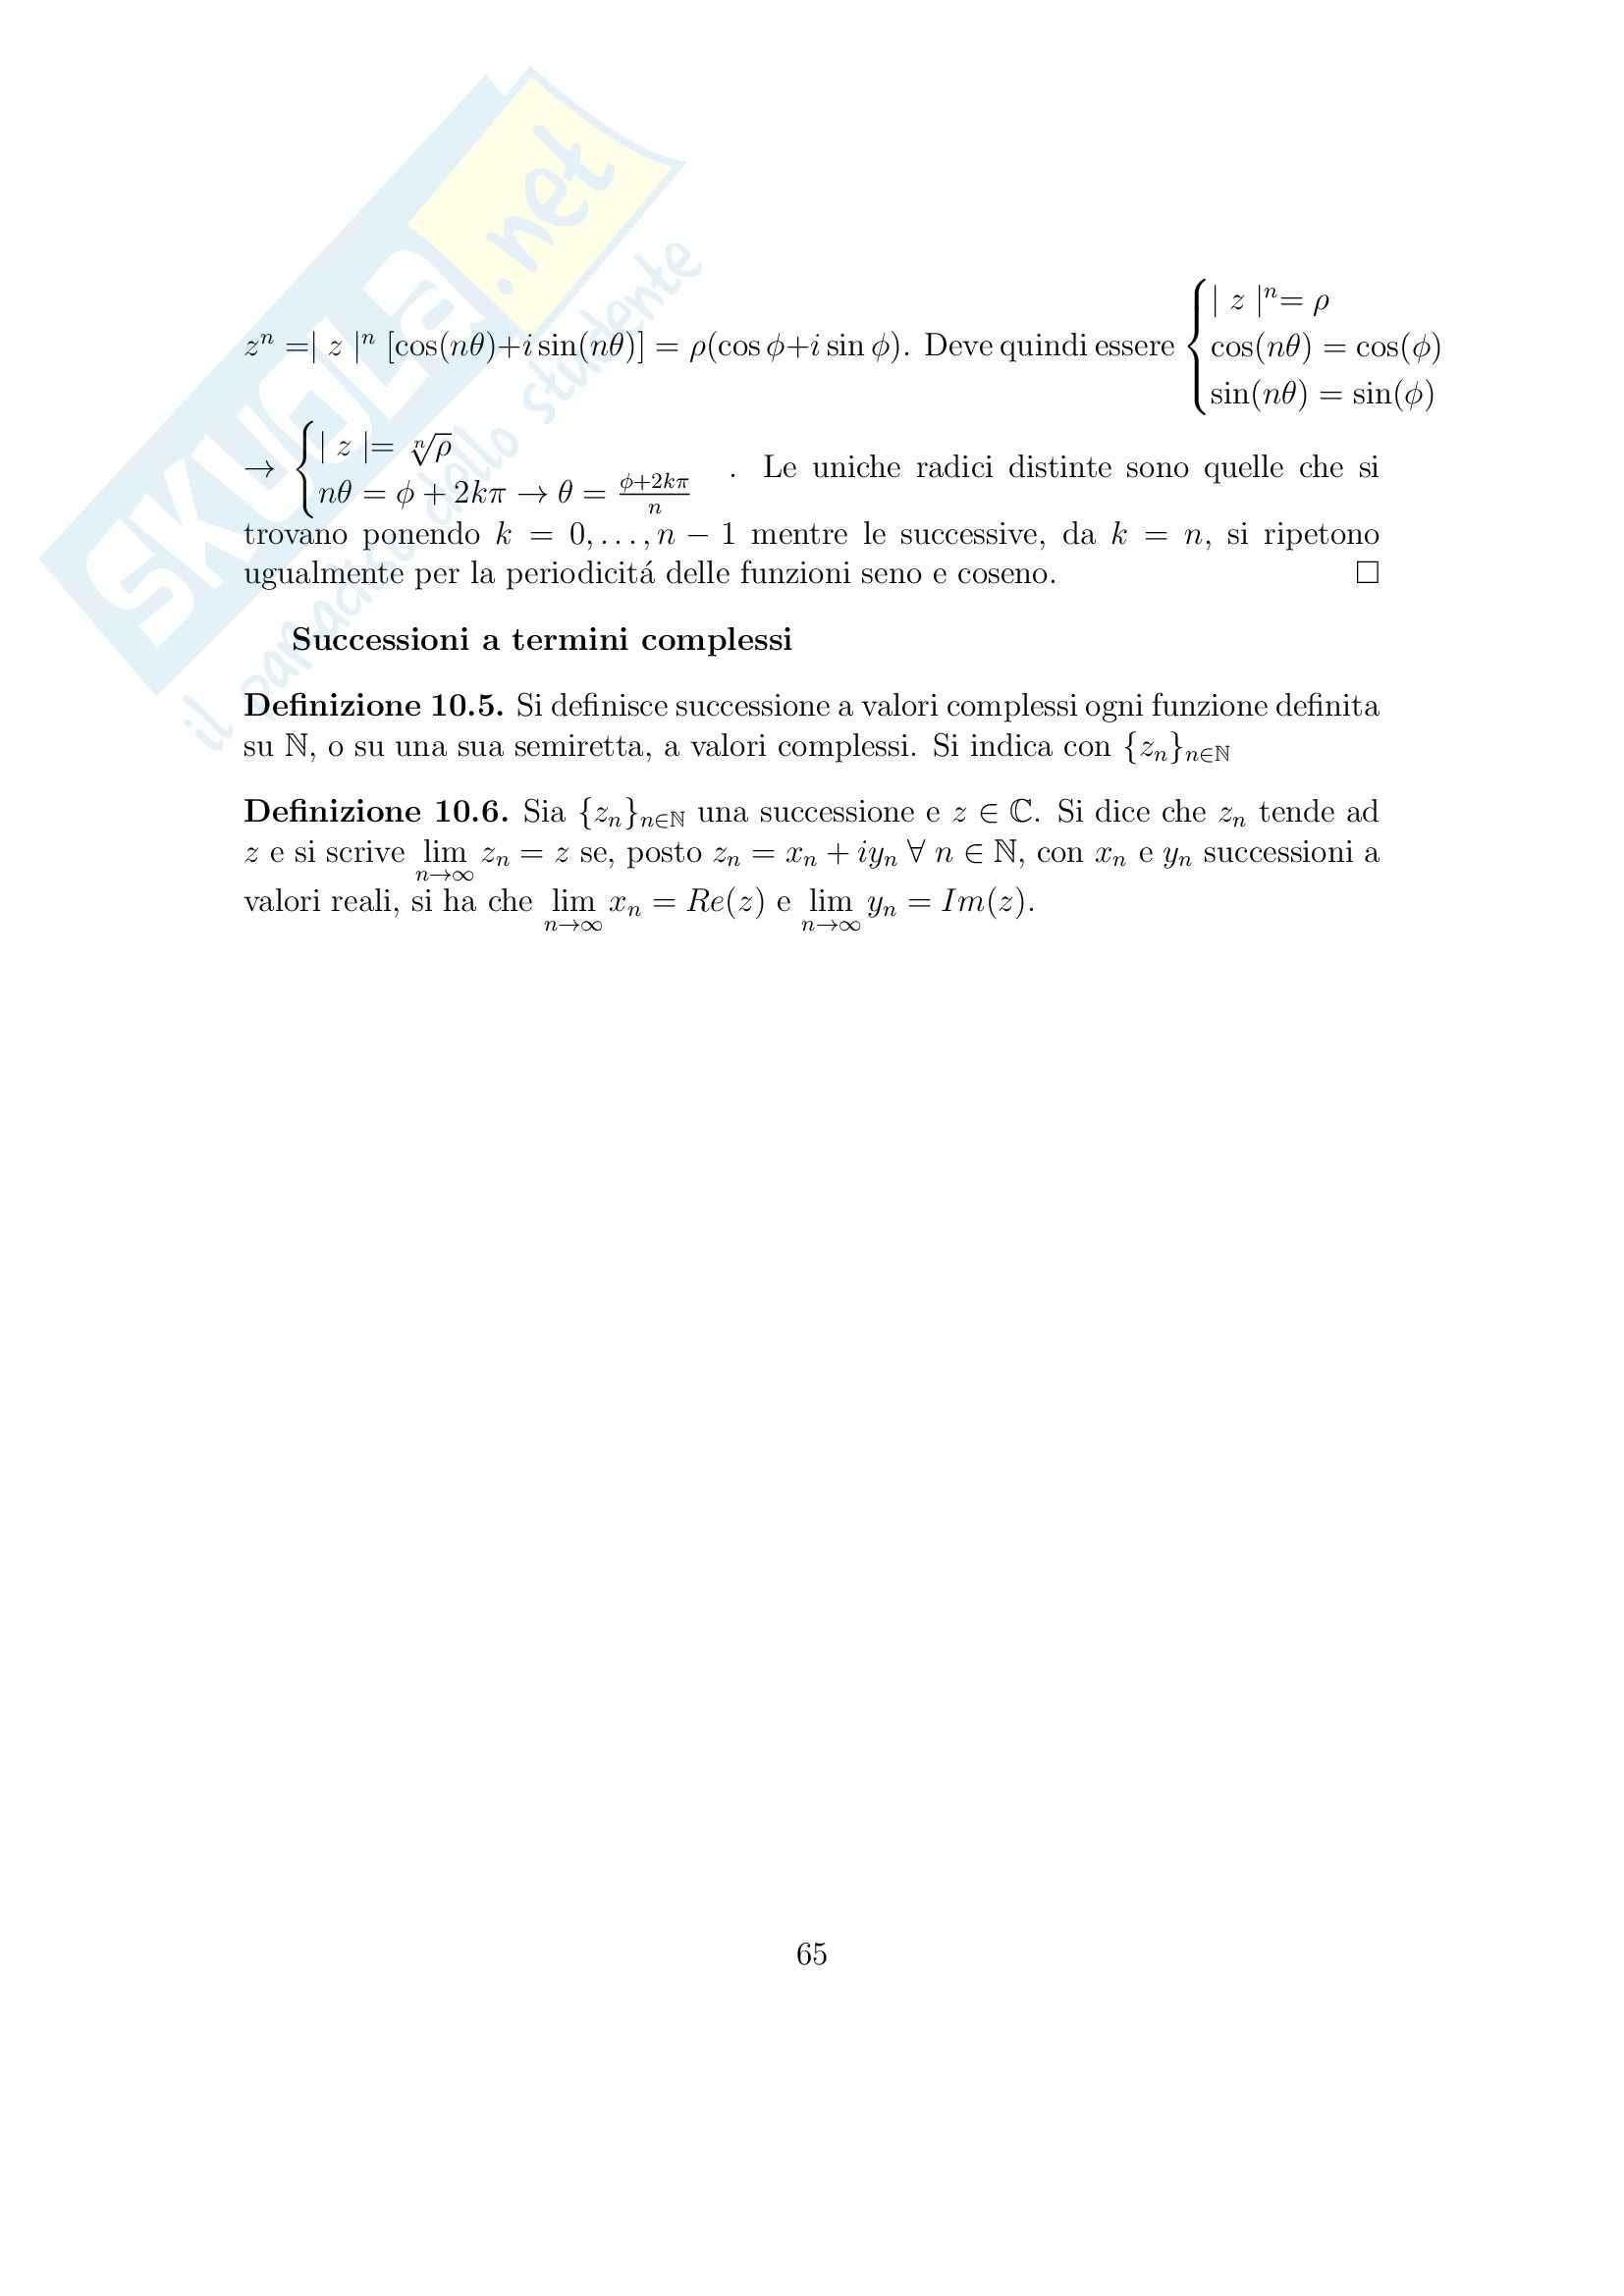 Analisi matematica 1 - Appunti Pag. 66